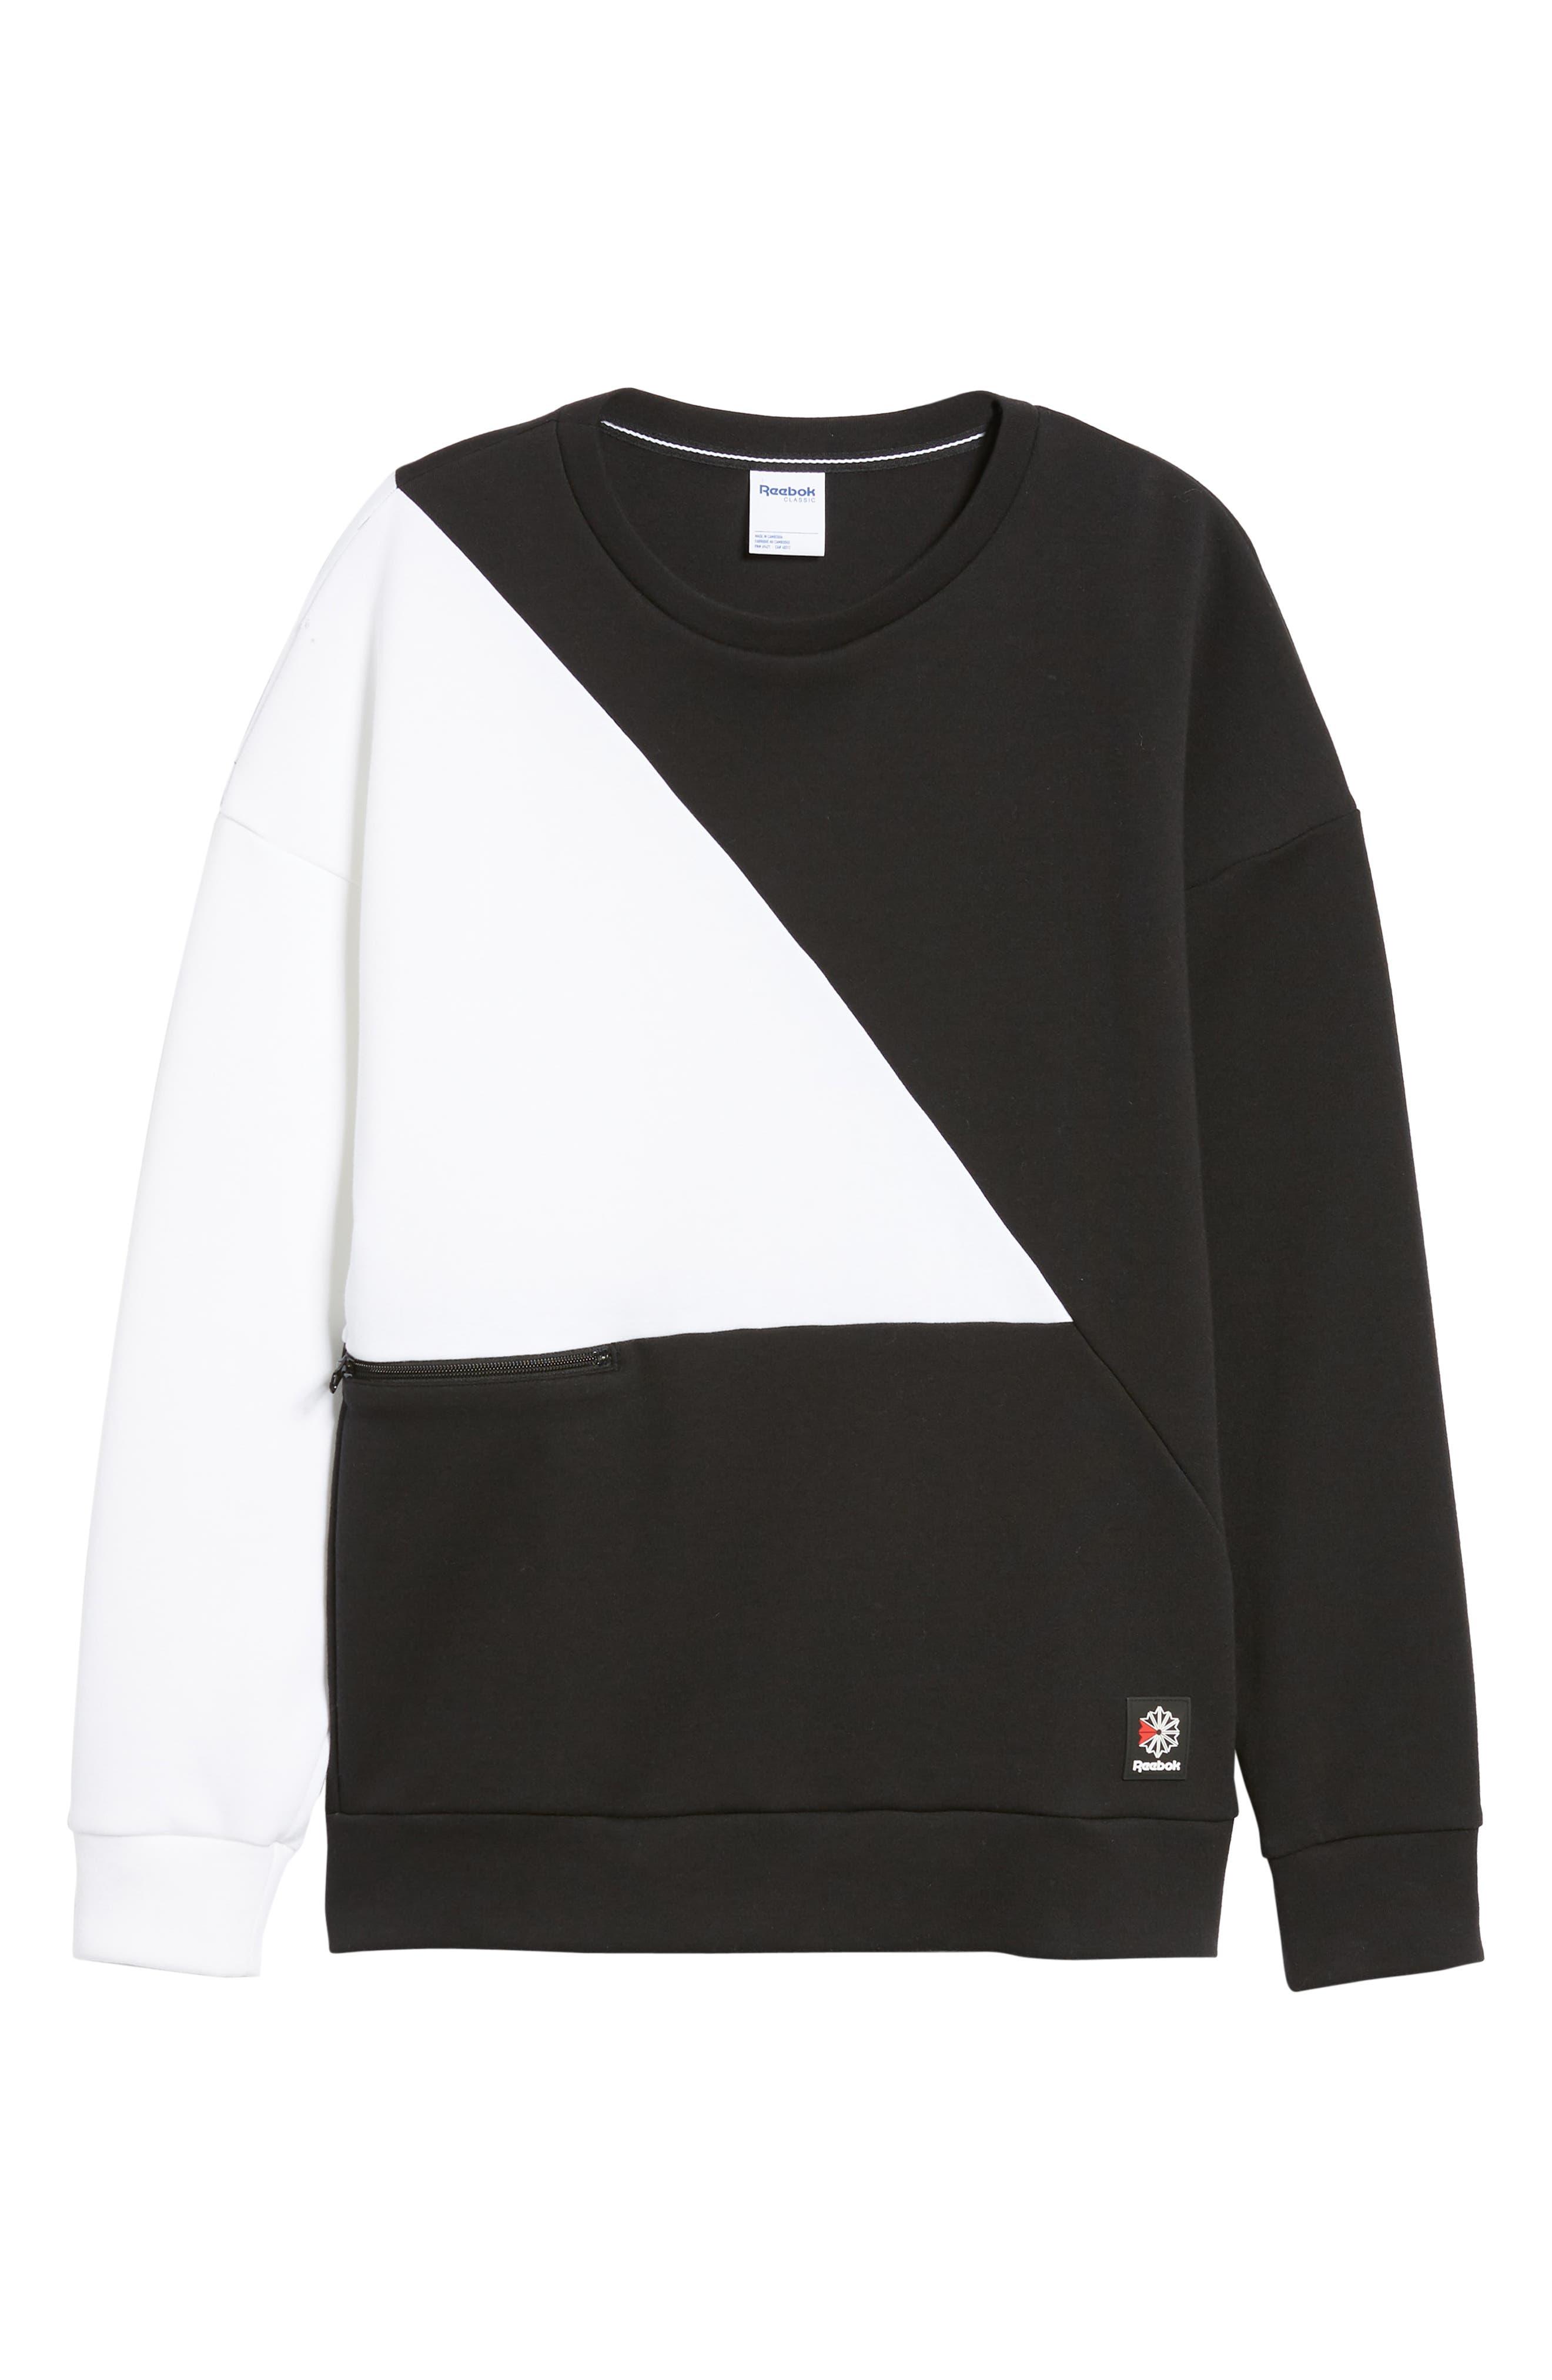 Colorblock Crewneck Pullover,                             Alternate thumbnail 6, color,                             BLACK/WHITE